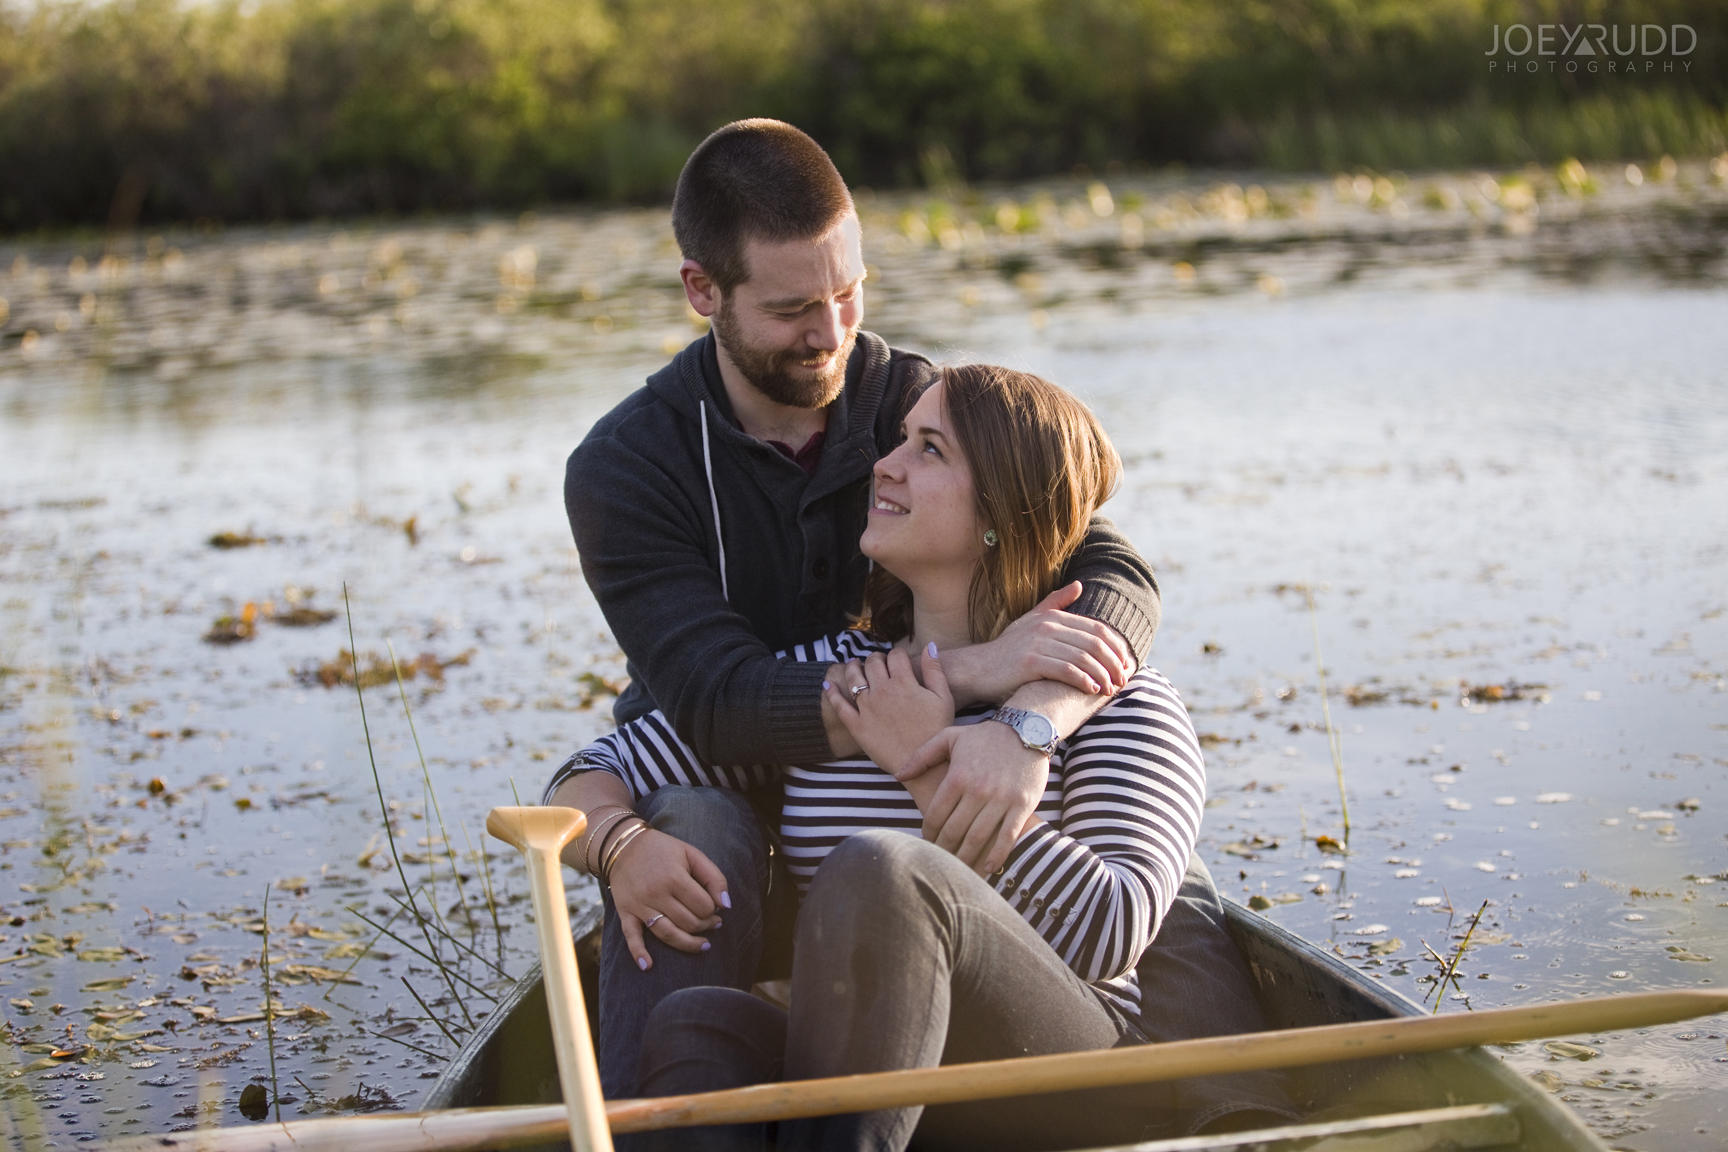 Rustic Engagement by Ottawa Wedding Photographer Joey Rudd Photography Canoe Candid